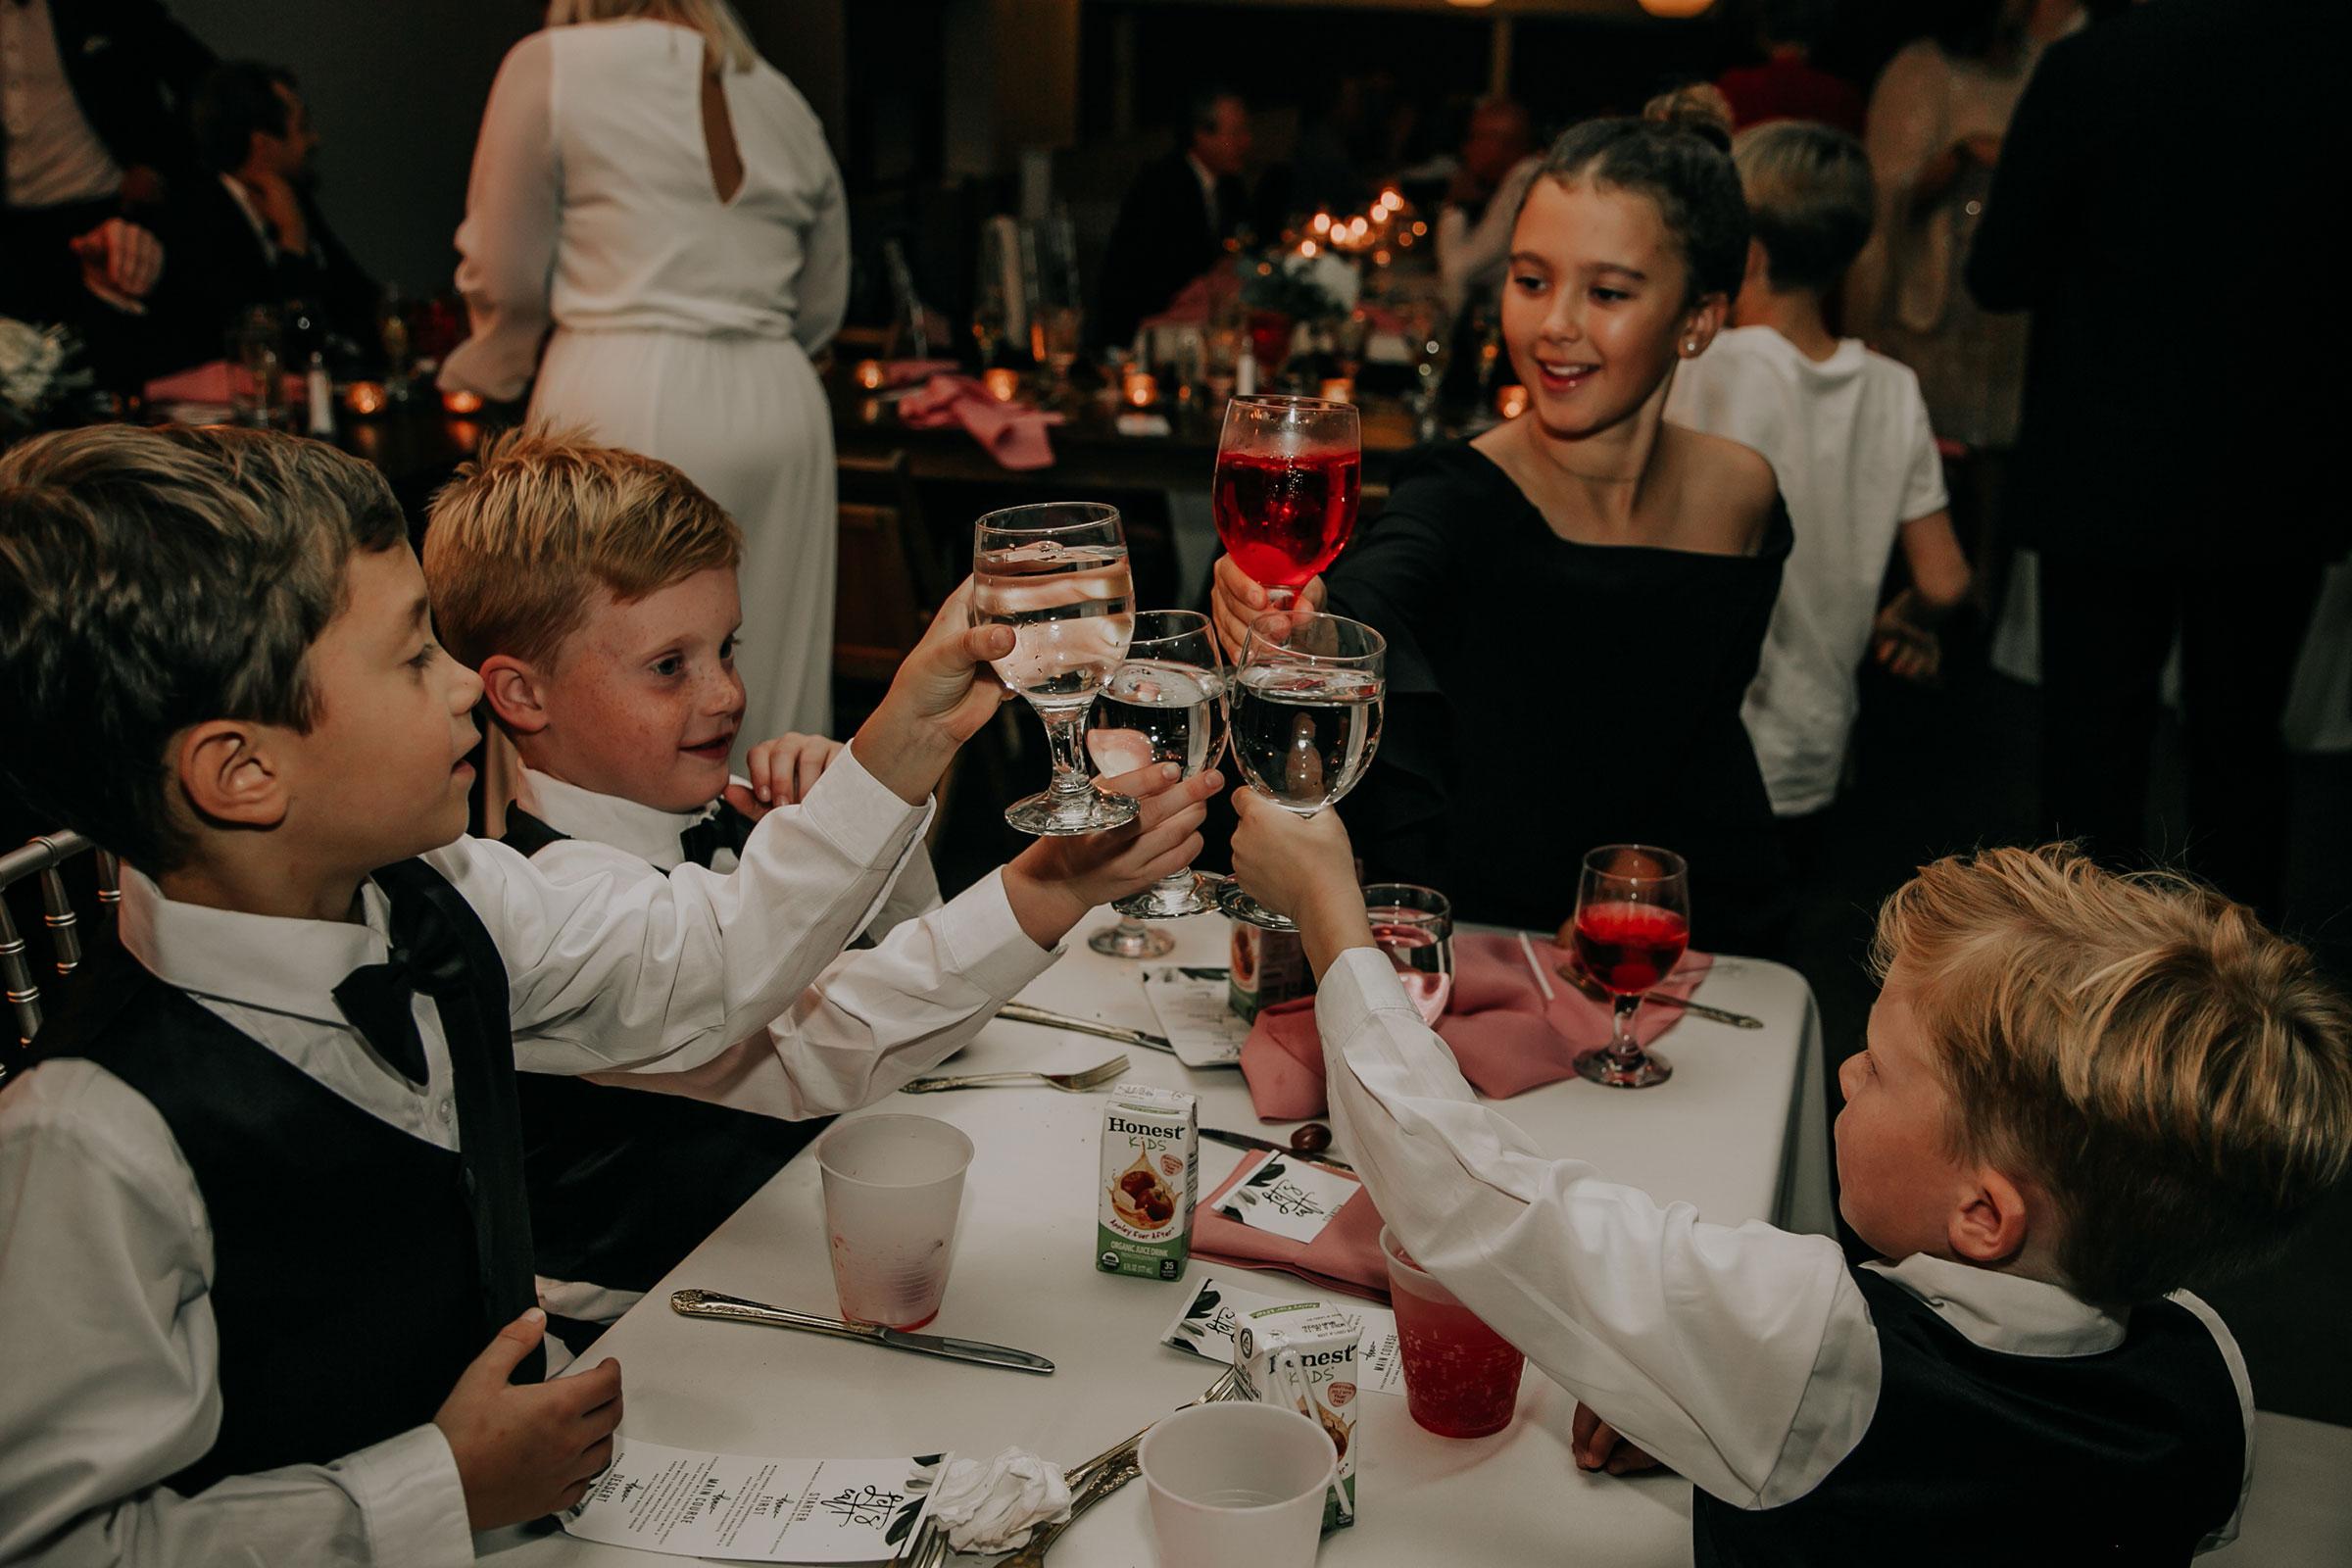 kids-toasting-at-reception-dinner-founders-one-nine-omaha-nebraska-raelyn-ramey-photography.jpg